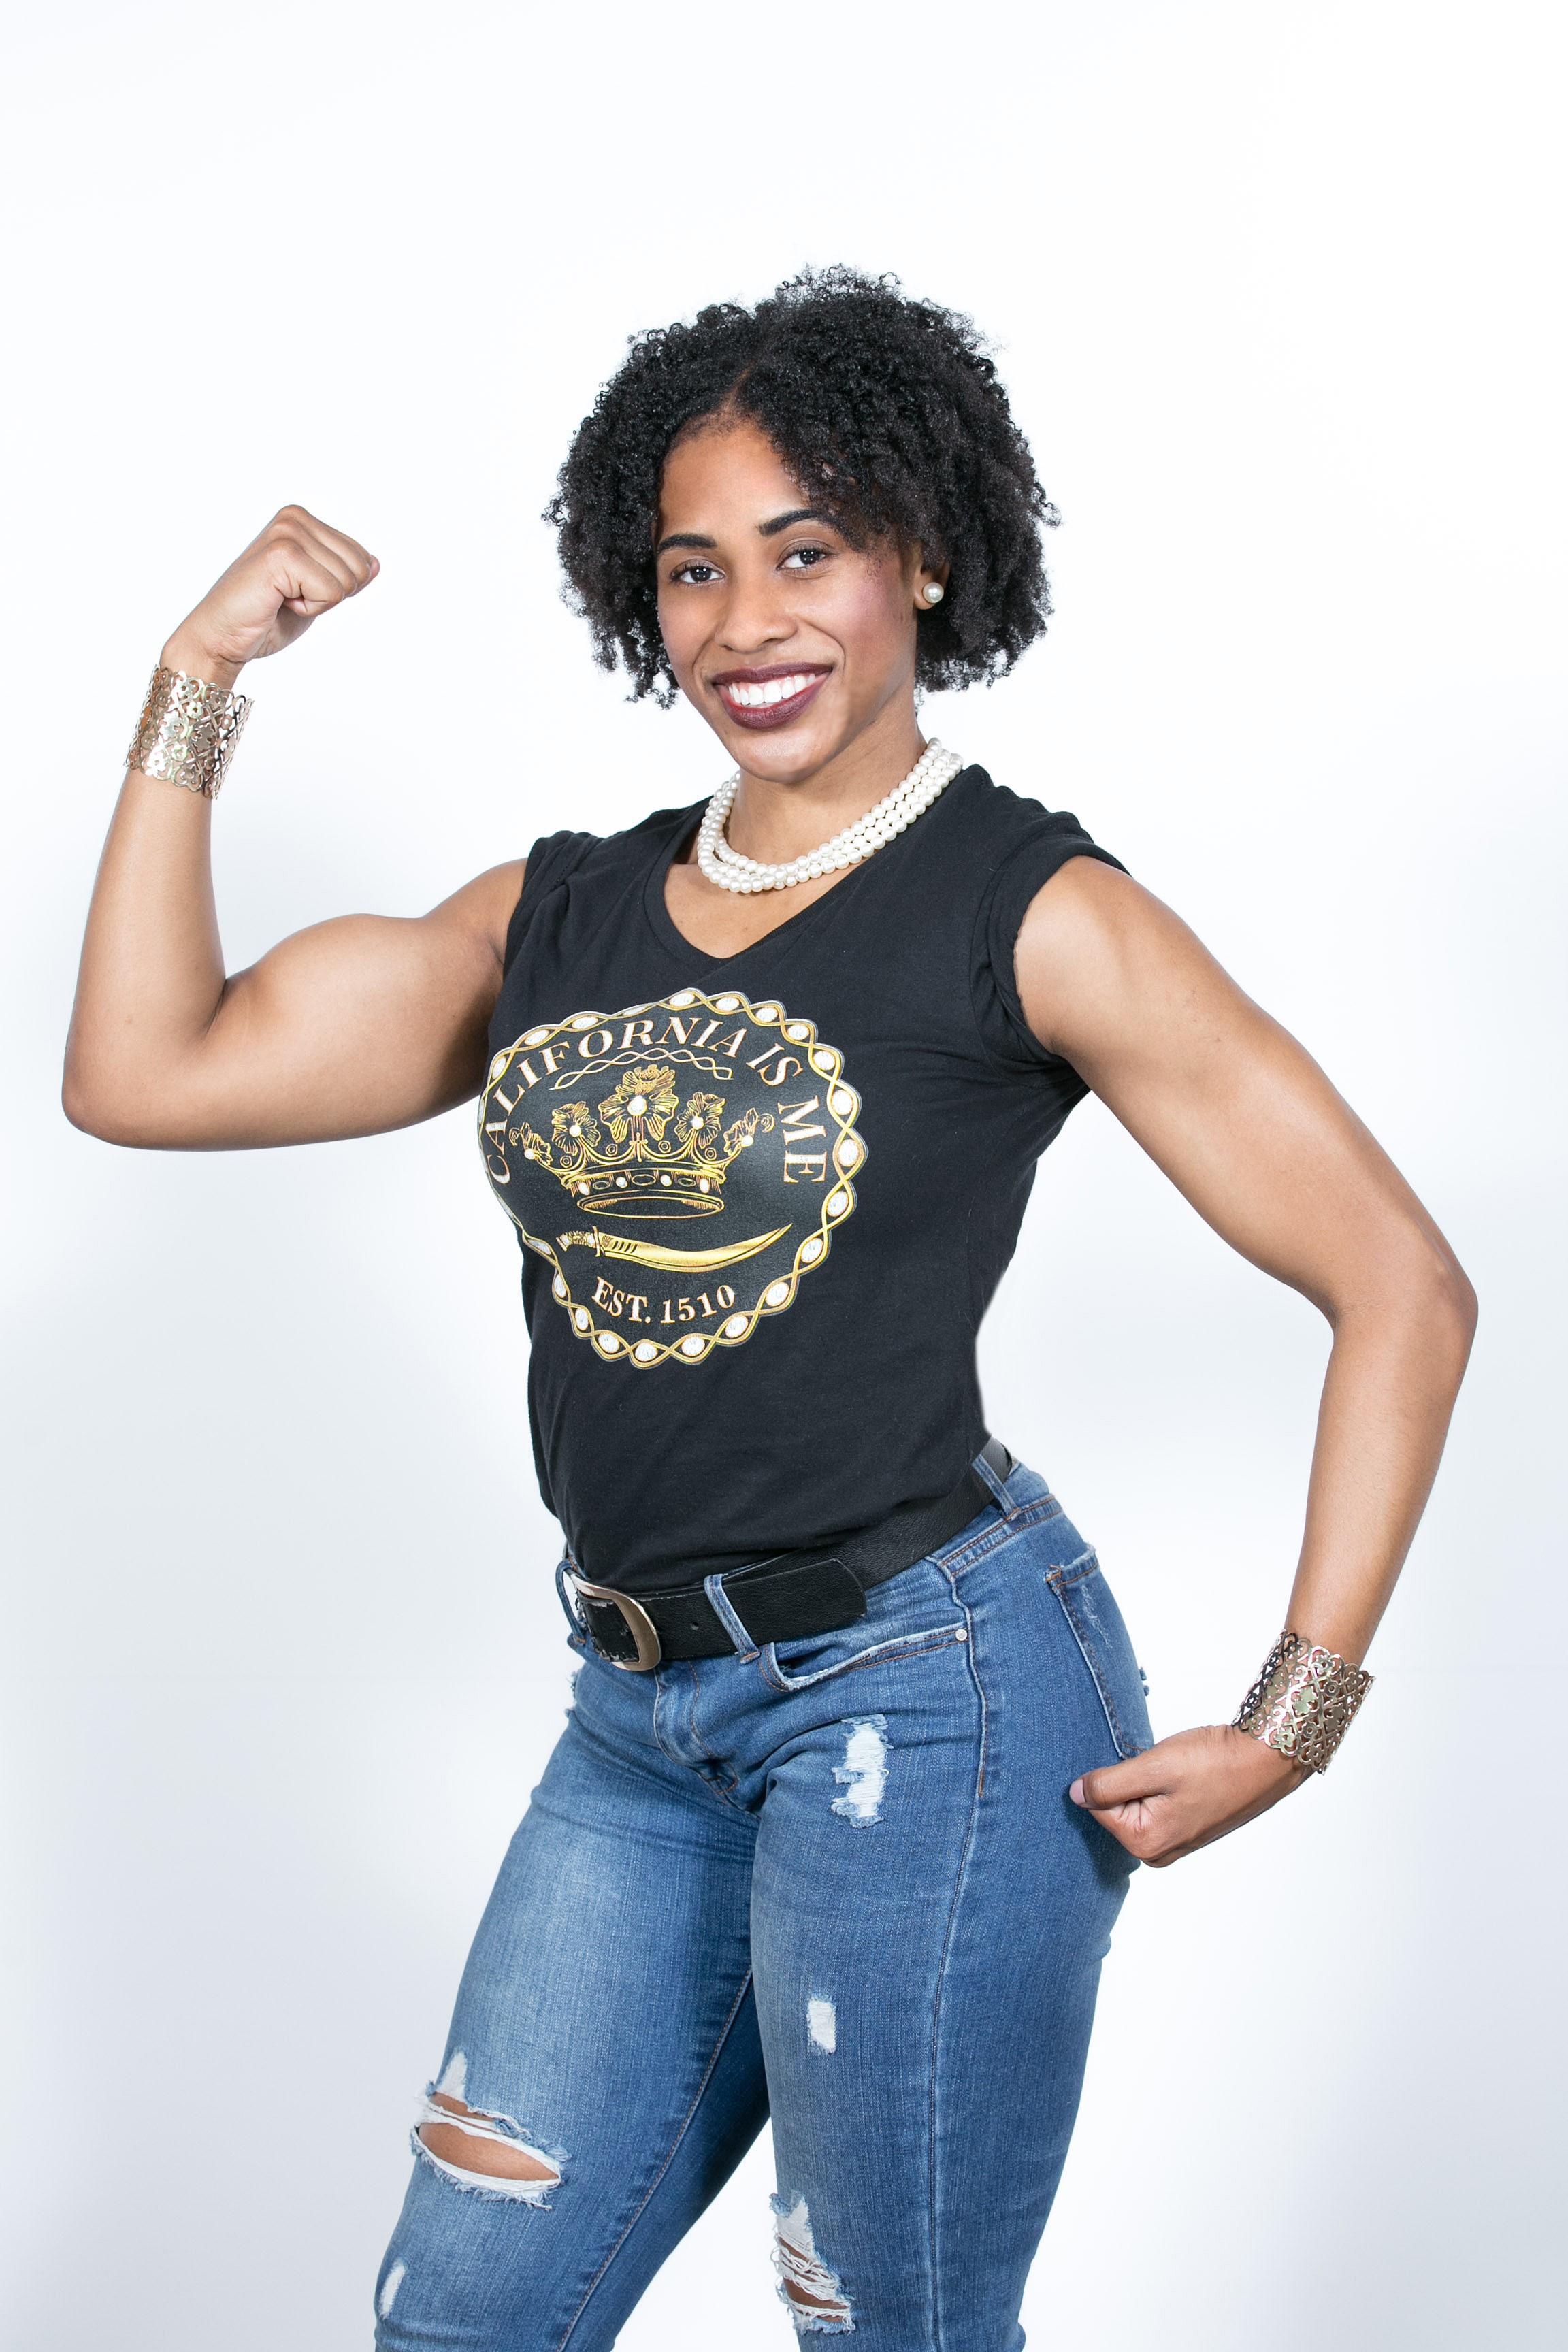 No! It's Queen Calafía's original black women Amazon warriors on golden California in the flesh! - California's beautiful Amazons ruled by Queen Calafía slay barriers all day!